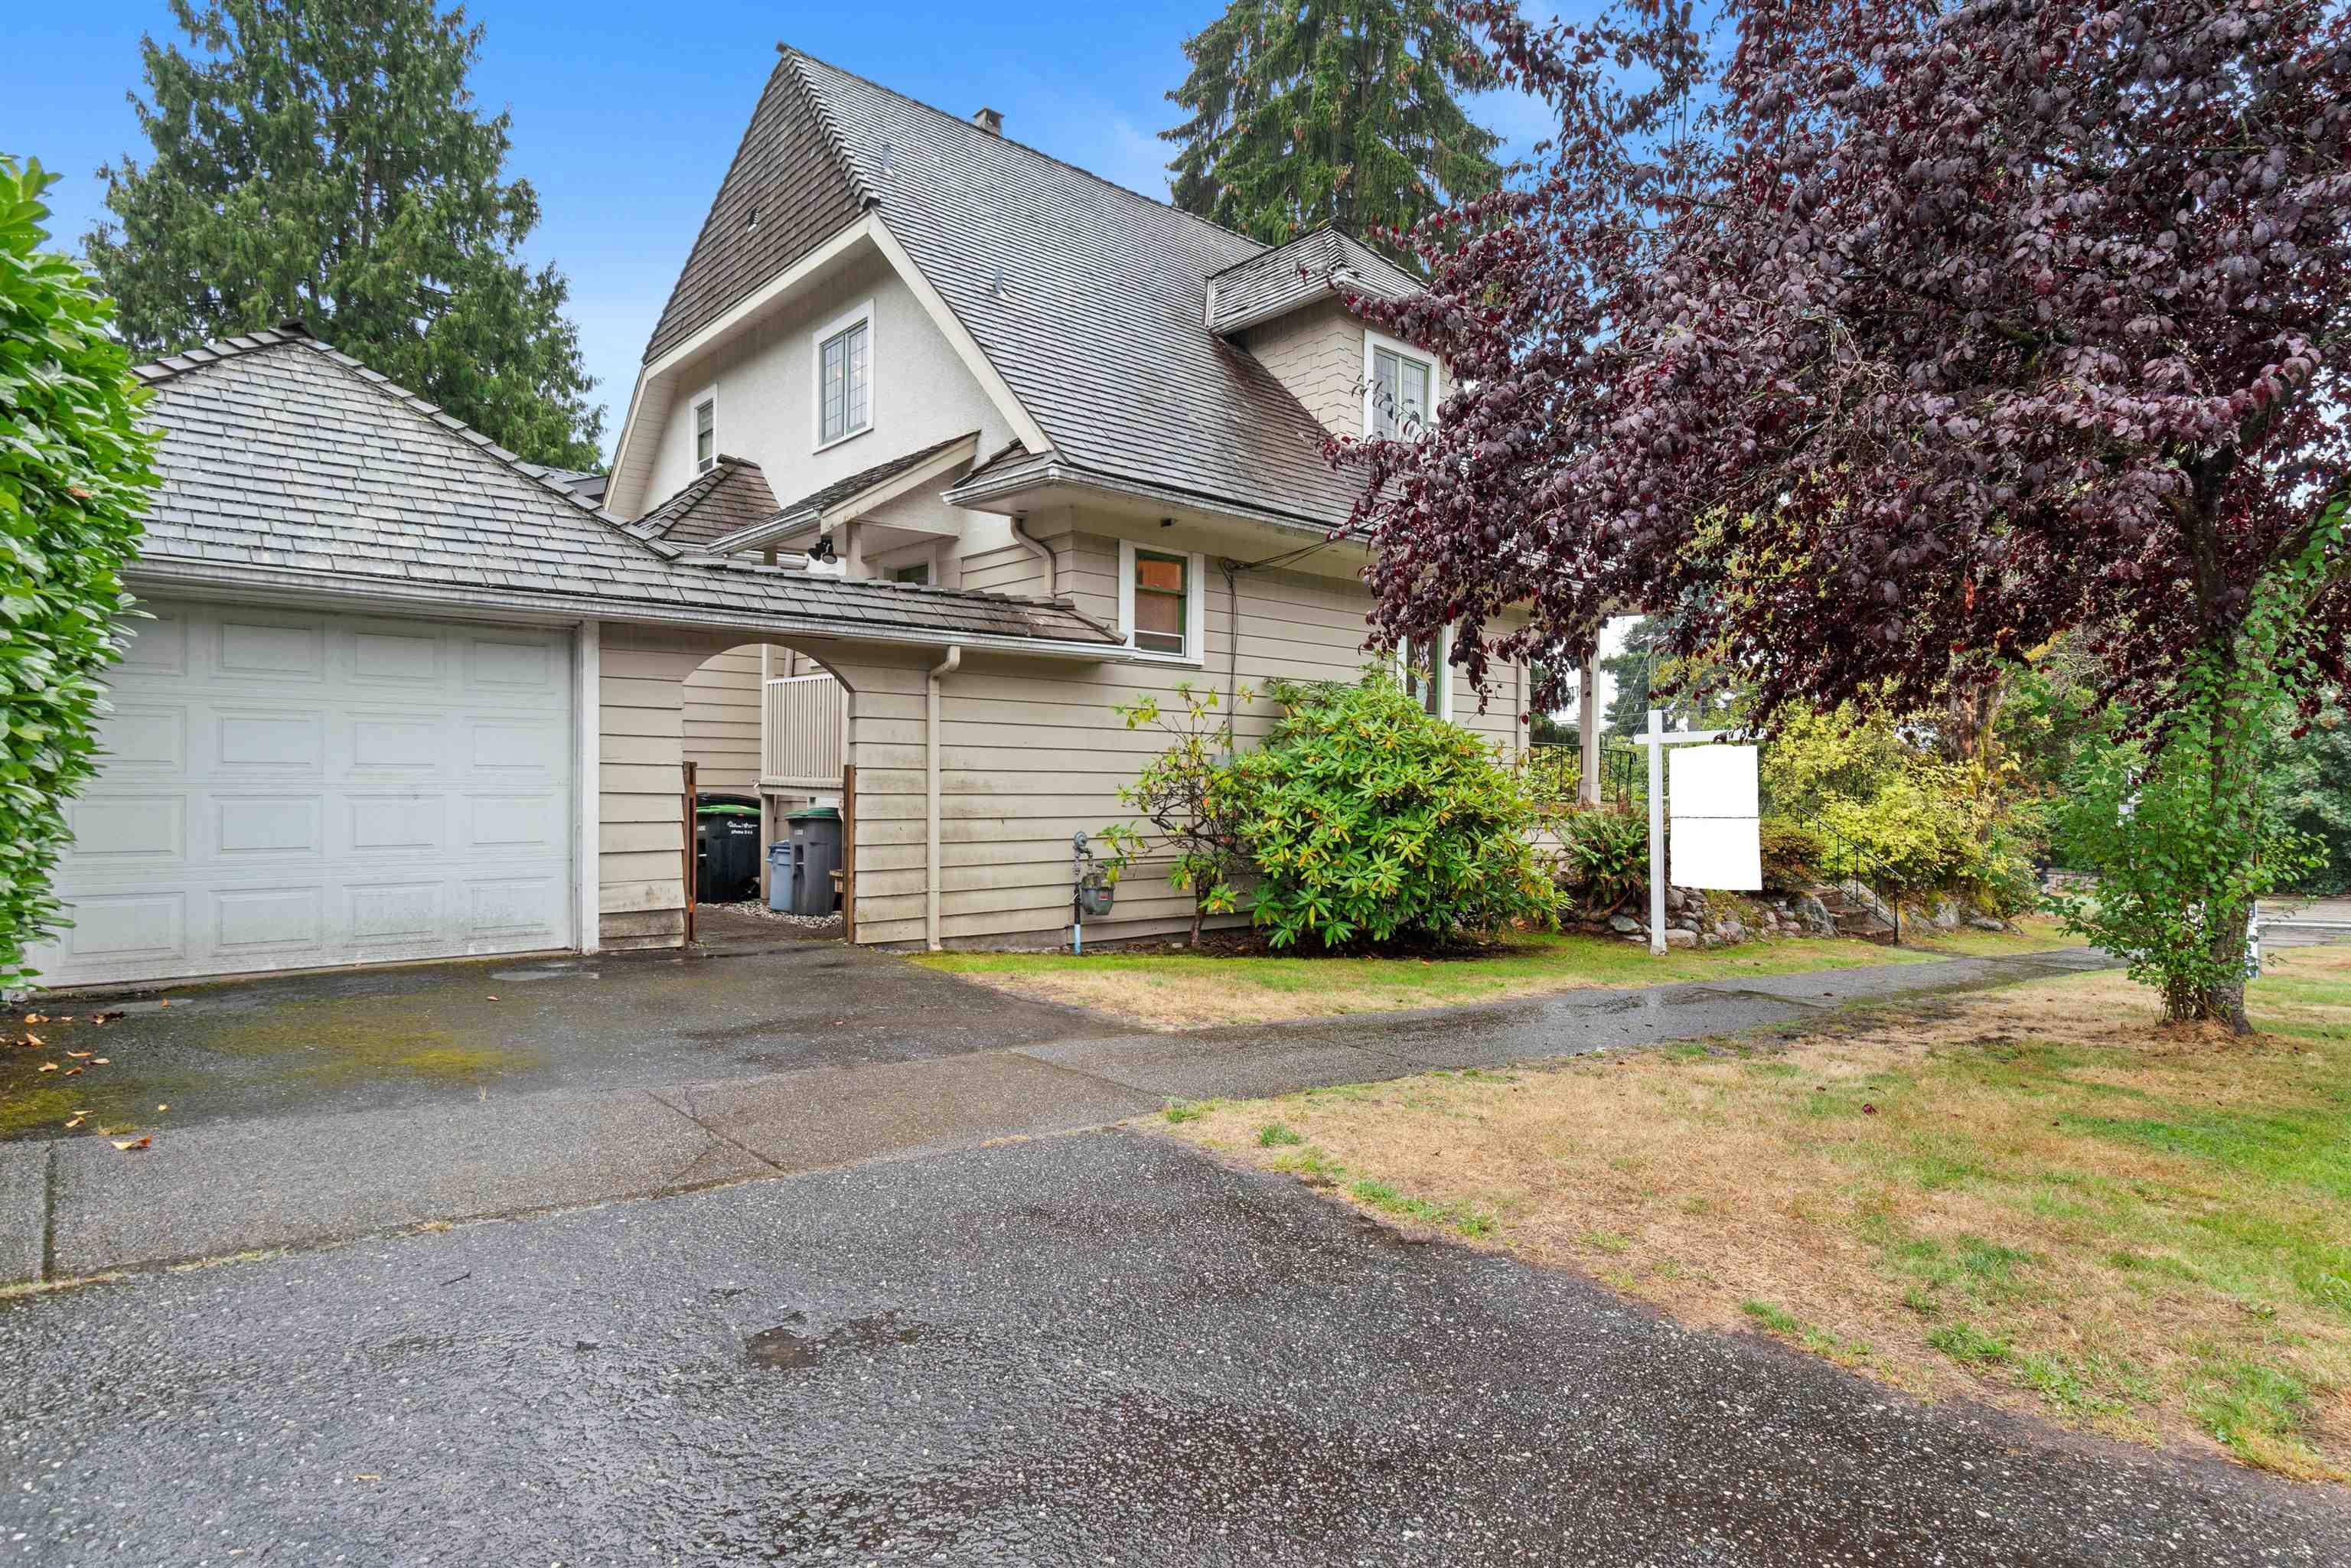 5510 BLENHEIM STREET - Kerrisdale House/Single Family for sale, 3 Bedrooms (R2613554)